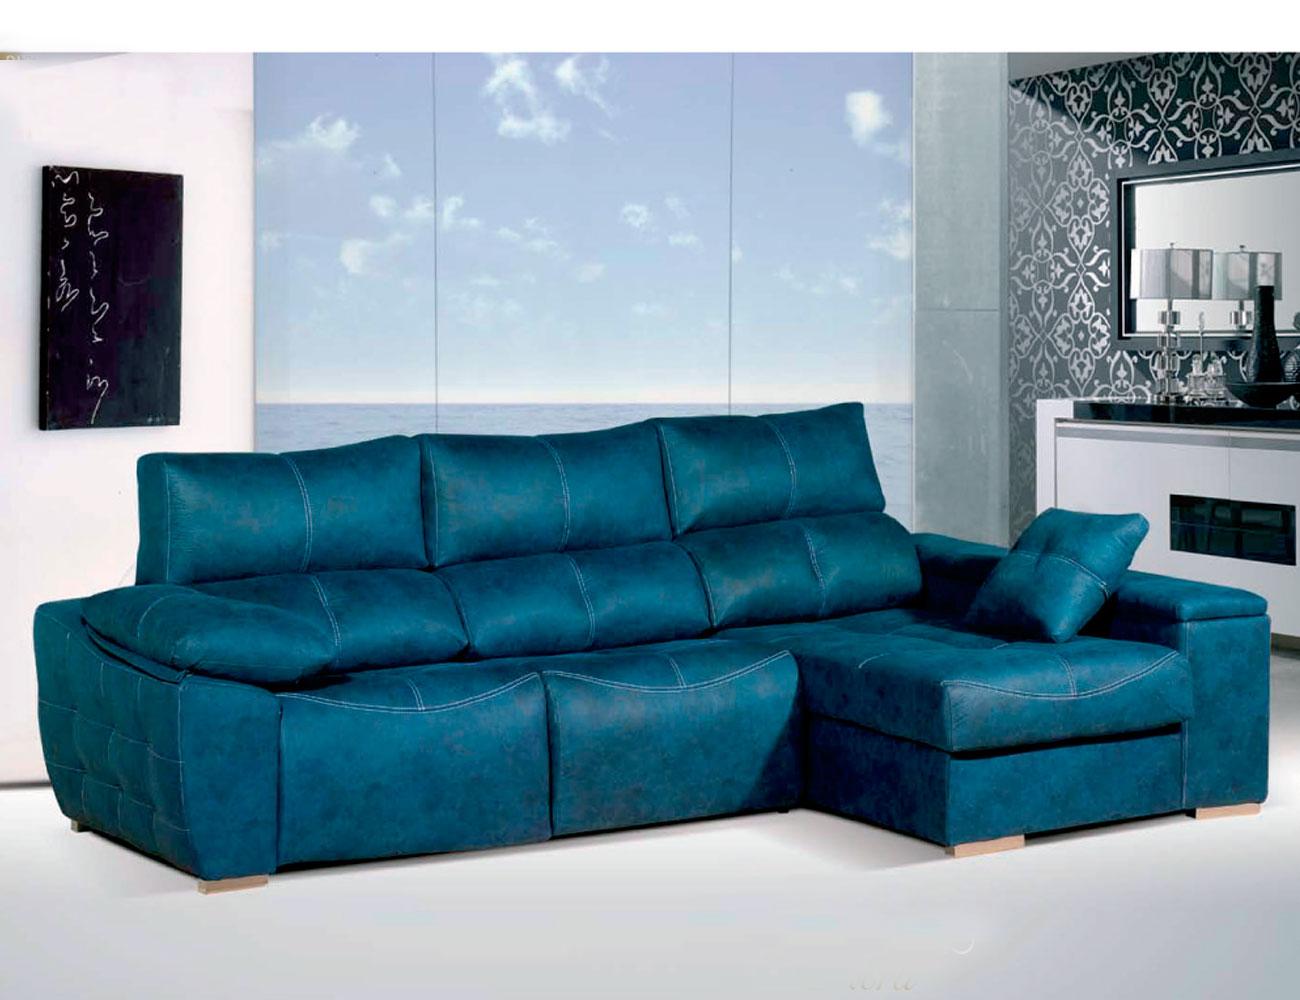 Sofa chaiselongue relax 2 motores anti manchas turquesa50